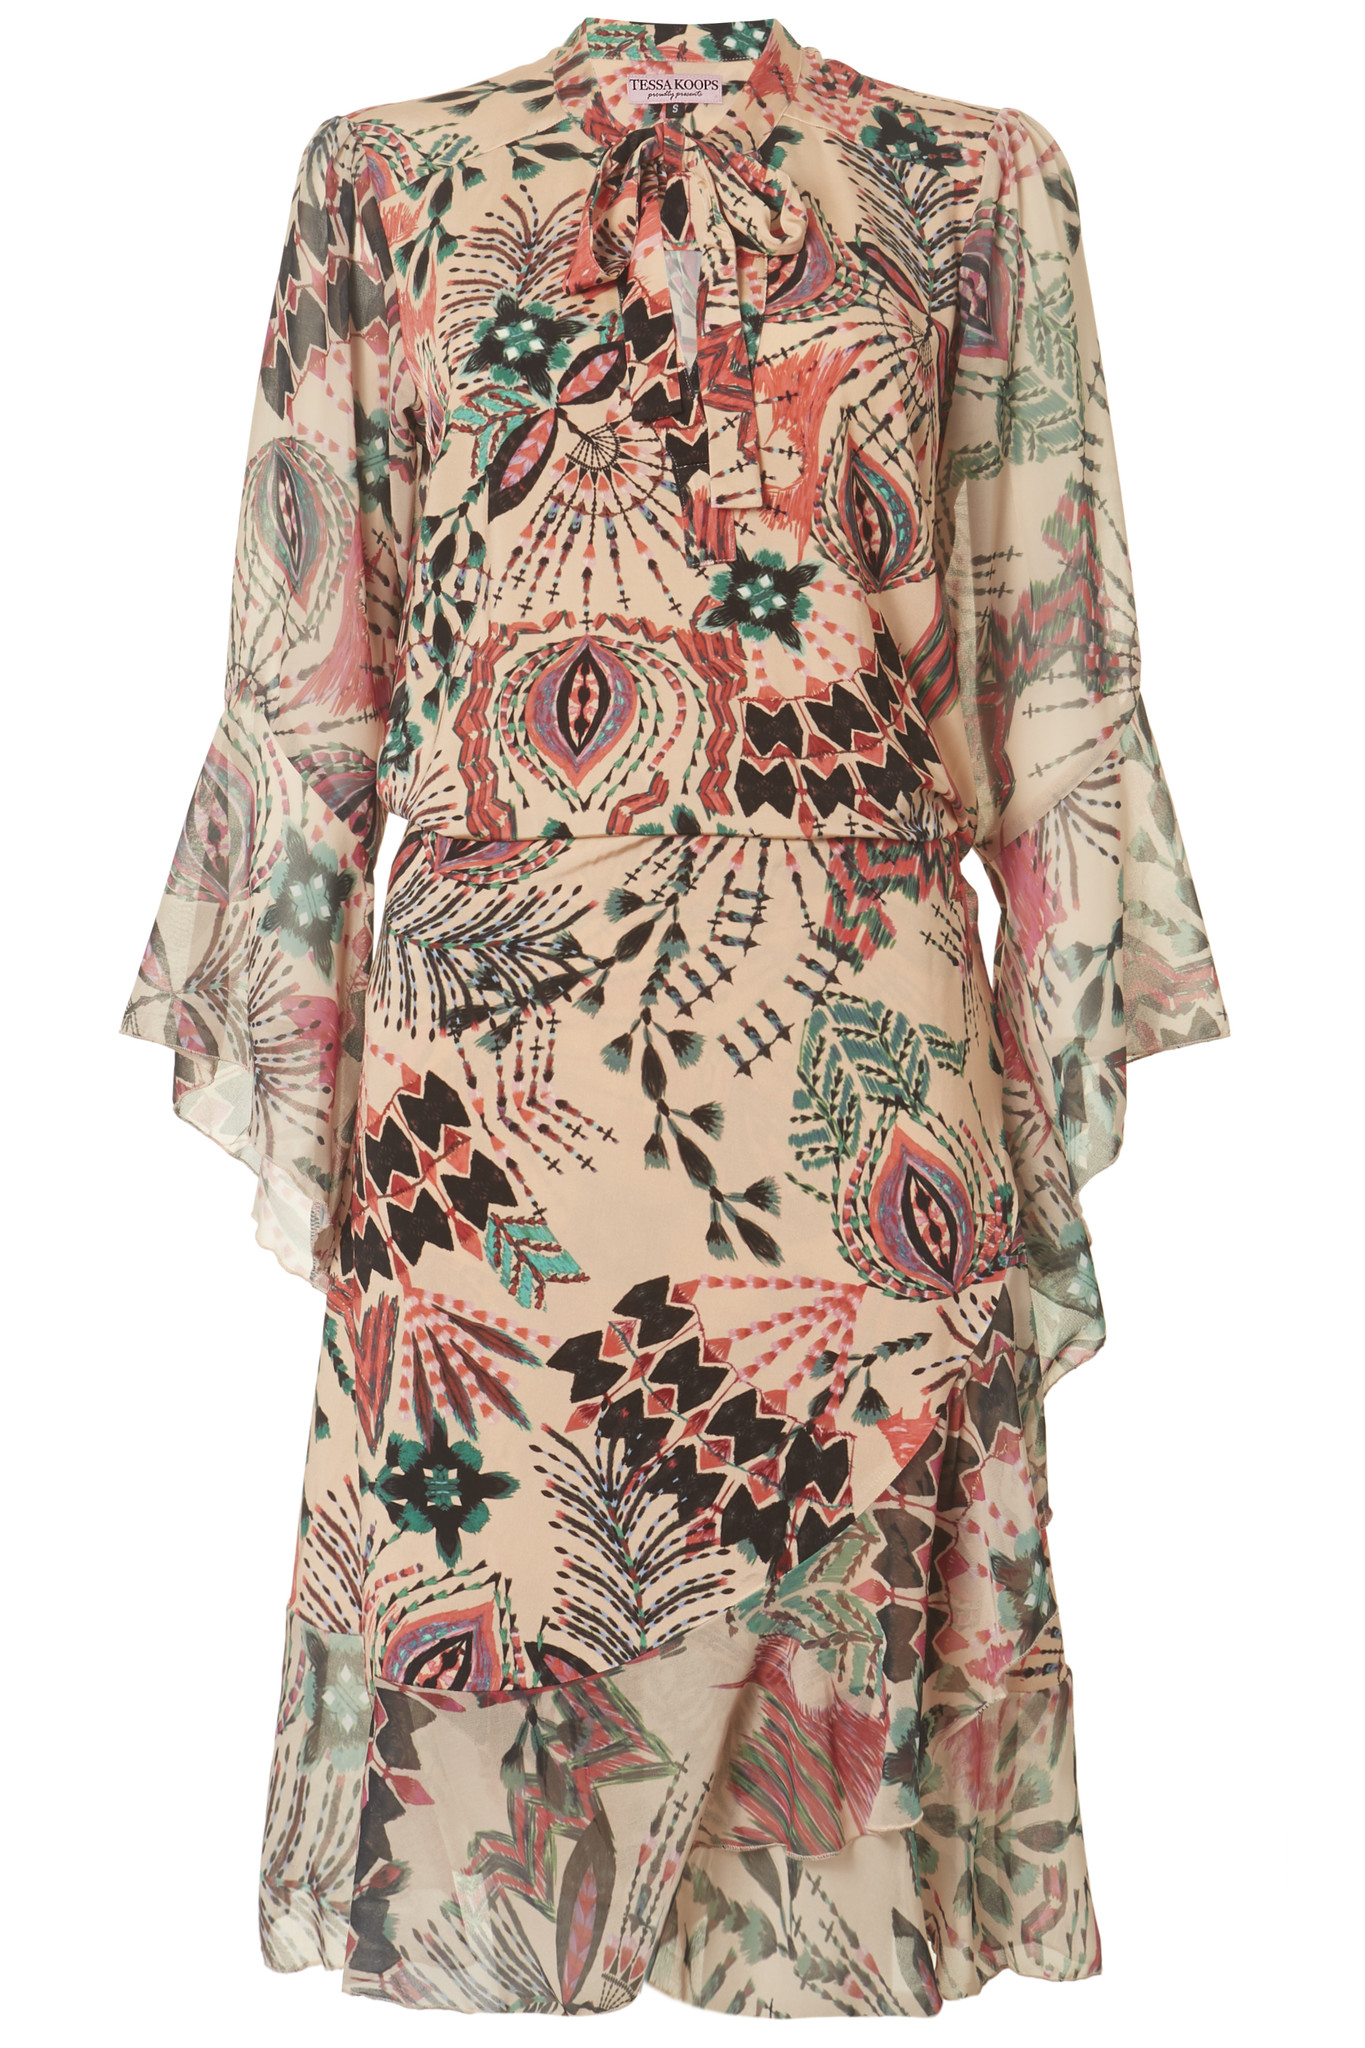 TESSA KOOPS ELVA PEACHES DRESS